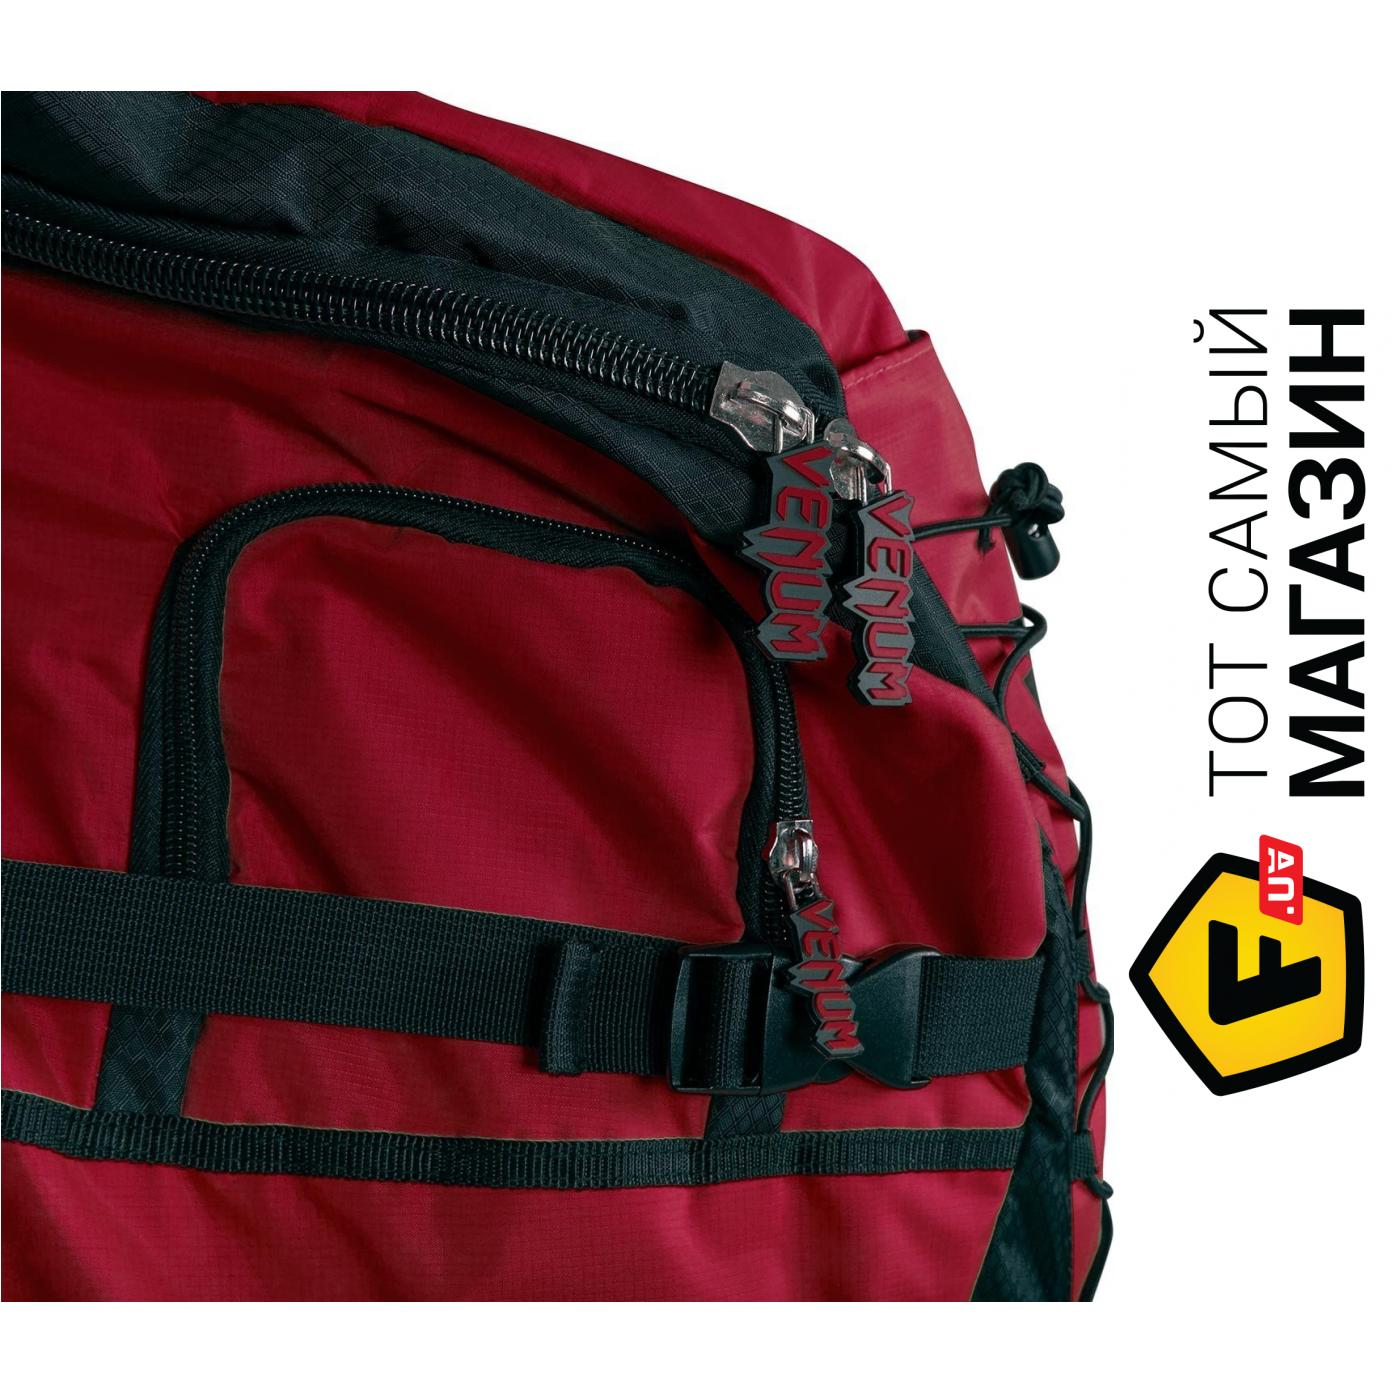 e5a8dd2c0e41 Venum Challenger Xtrem Backpack, черный/красный (HK-VENUM-2124)